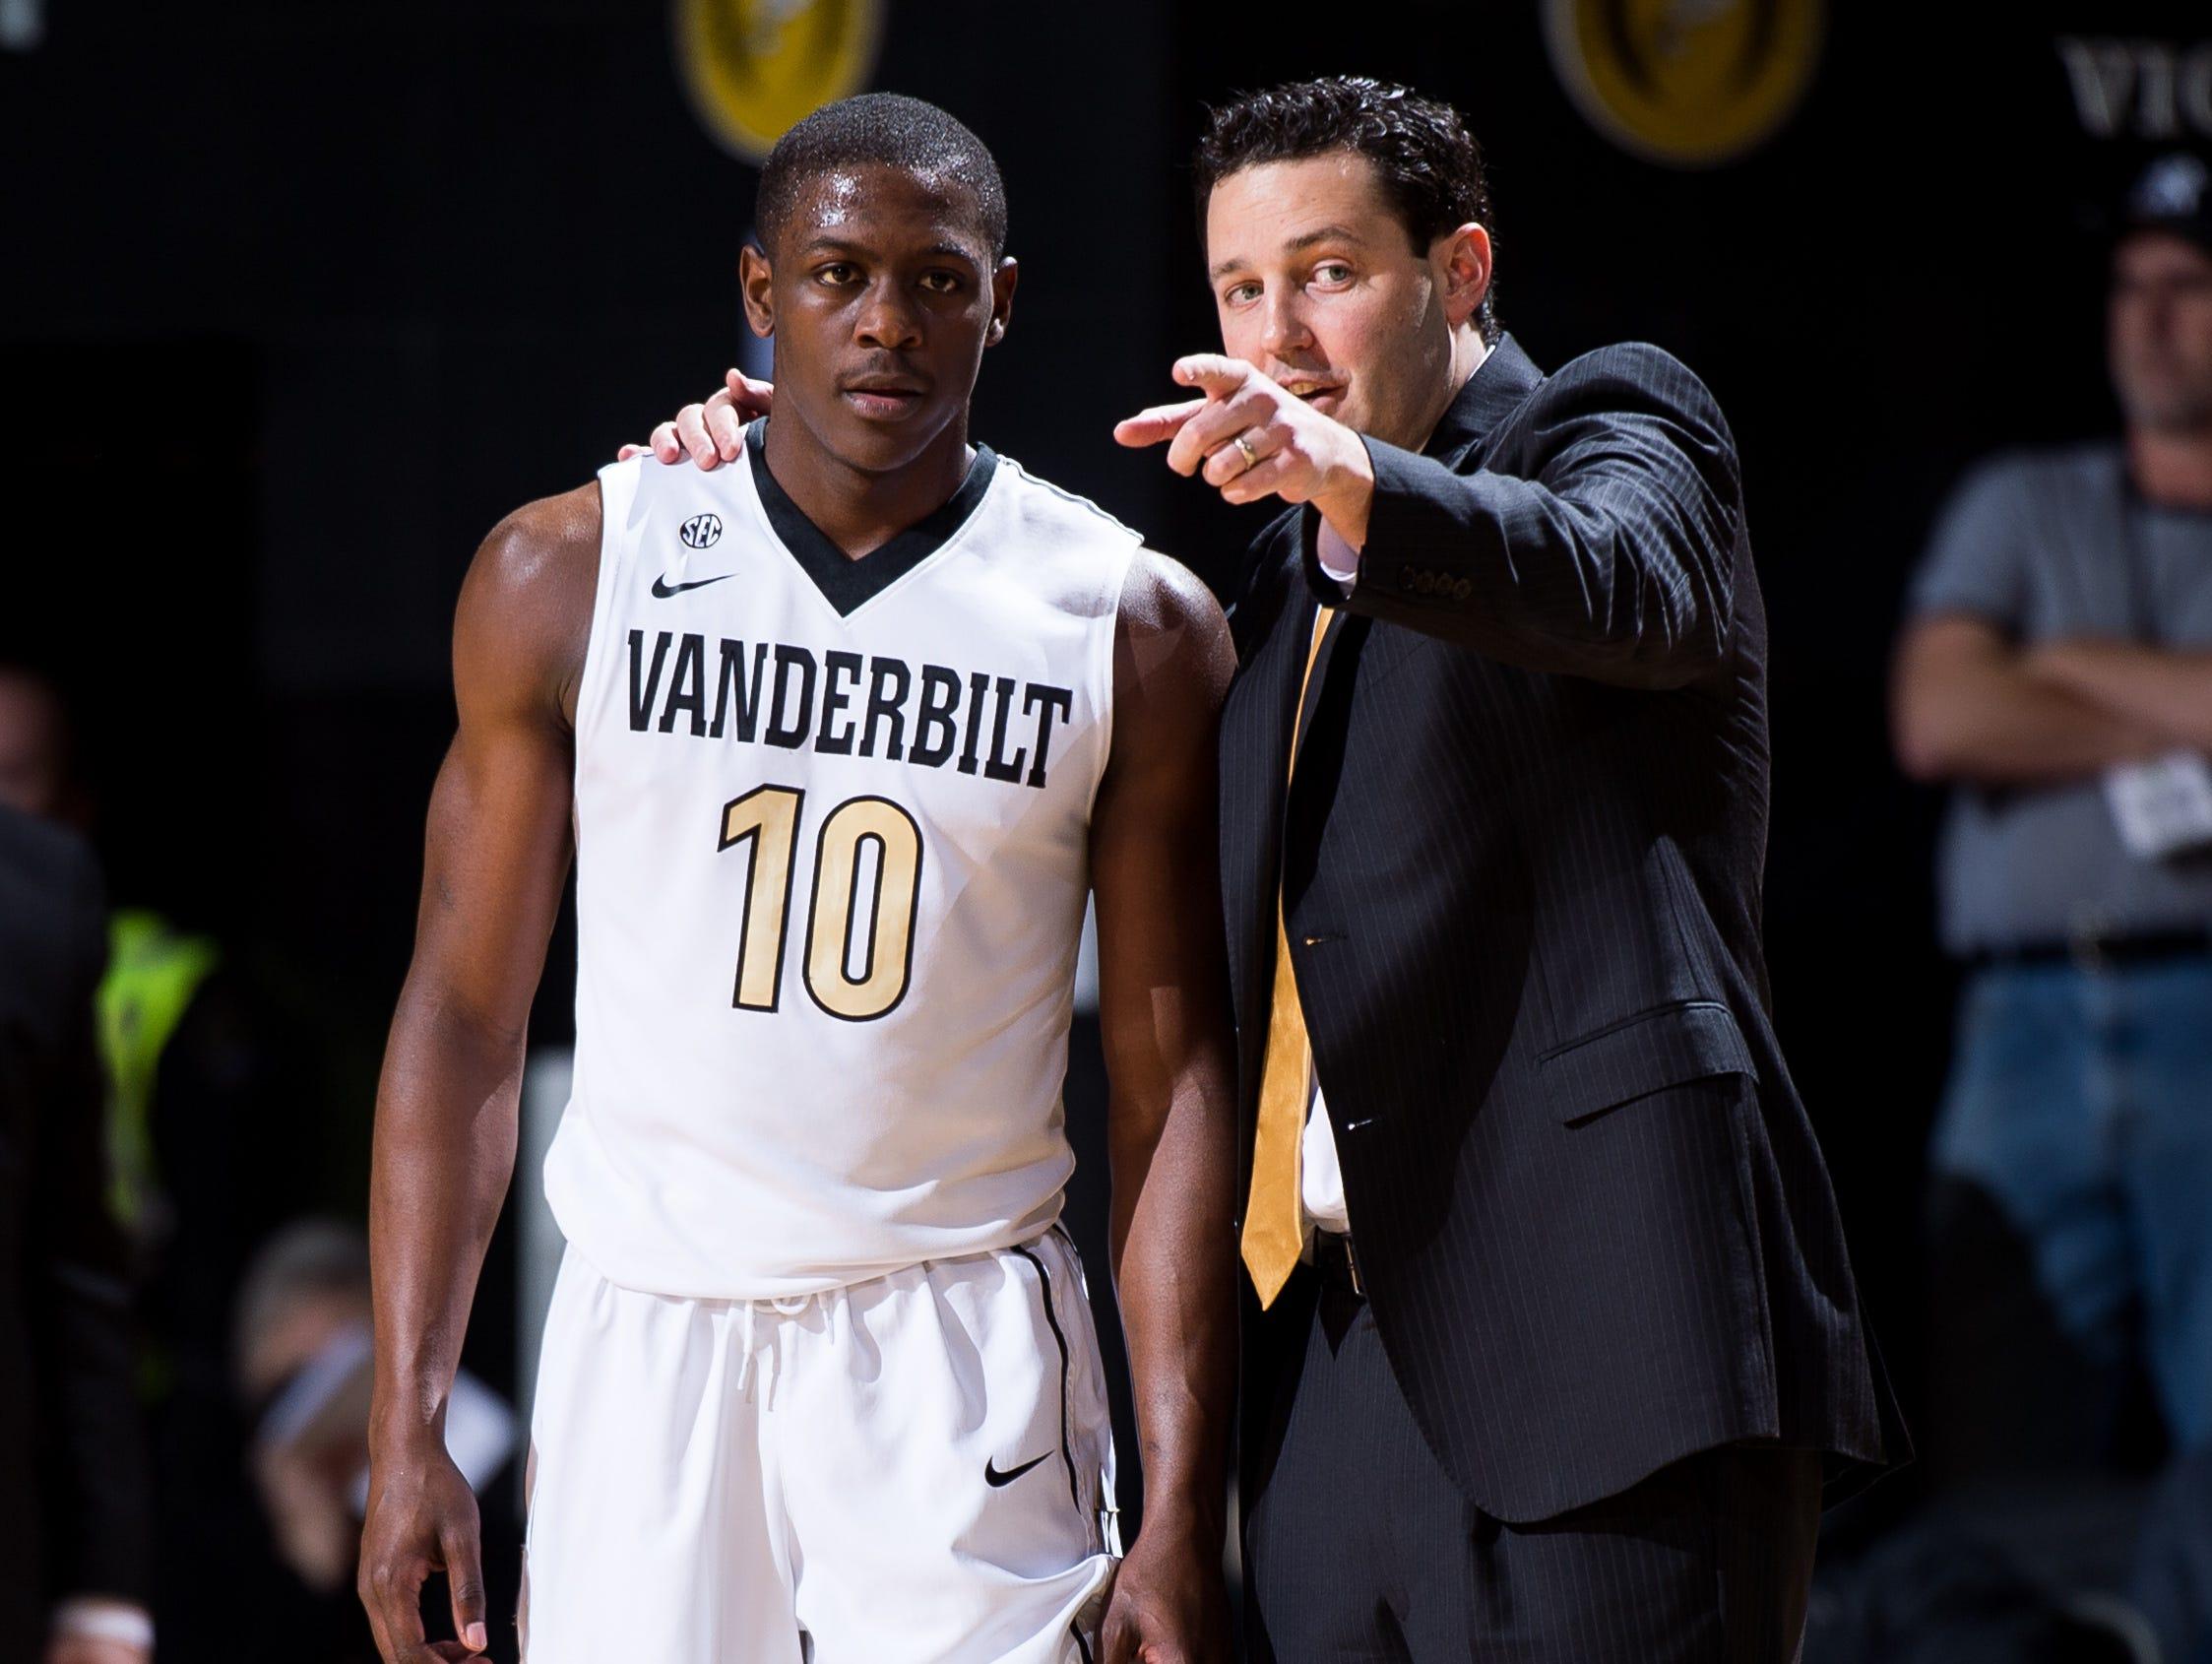 Uk Basketball: What Vanderbilt Basketball Still Can Play For This Season